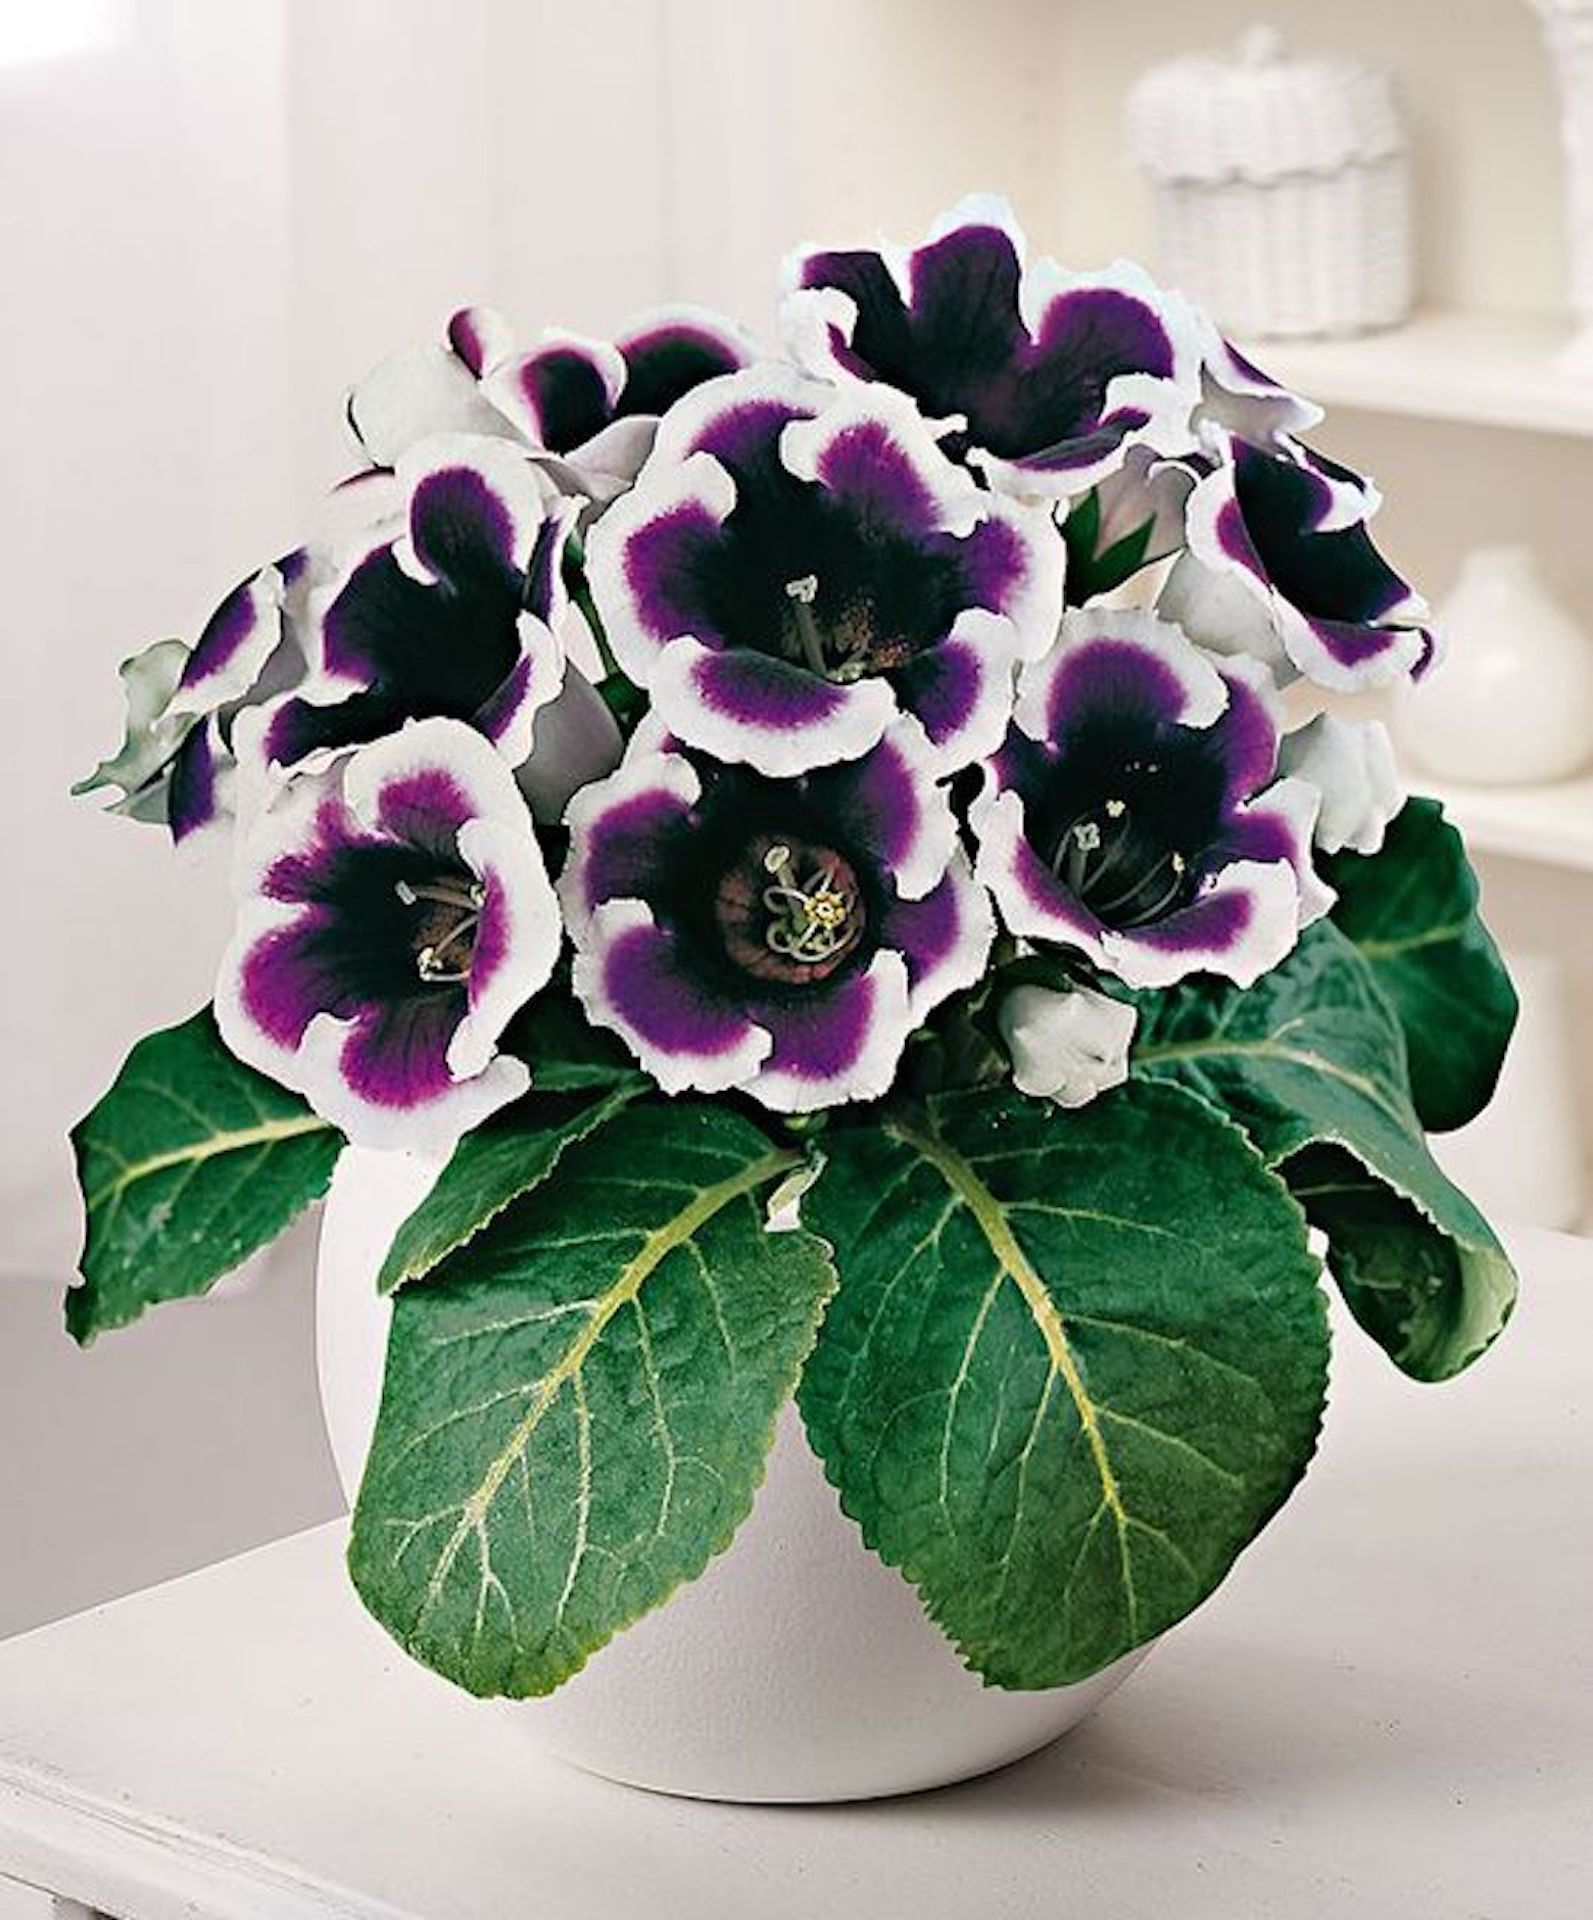 Florist's gloxinia 'Kaiser Wilhelm'